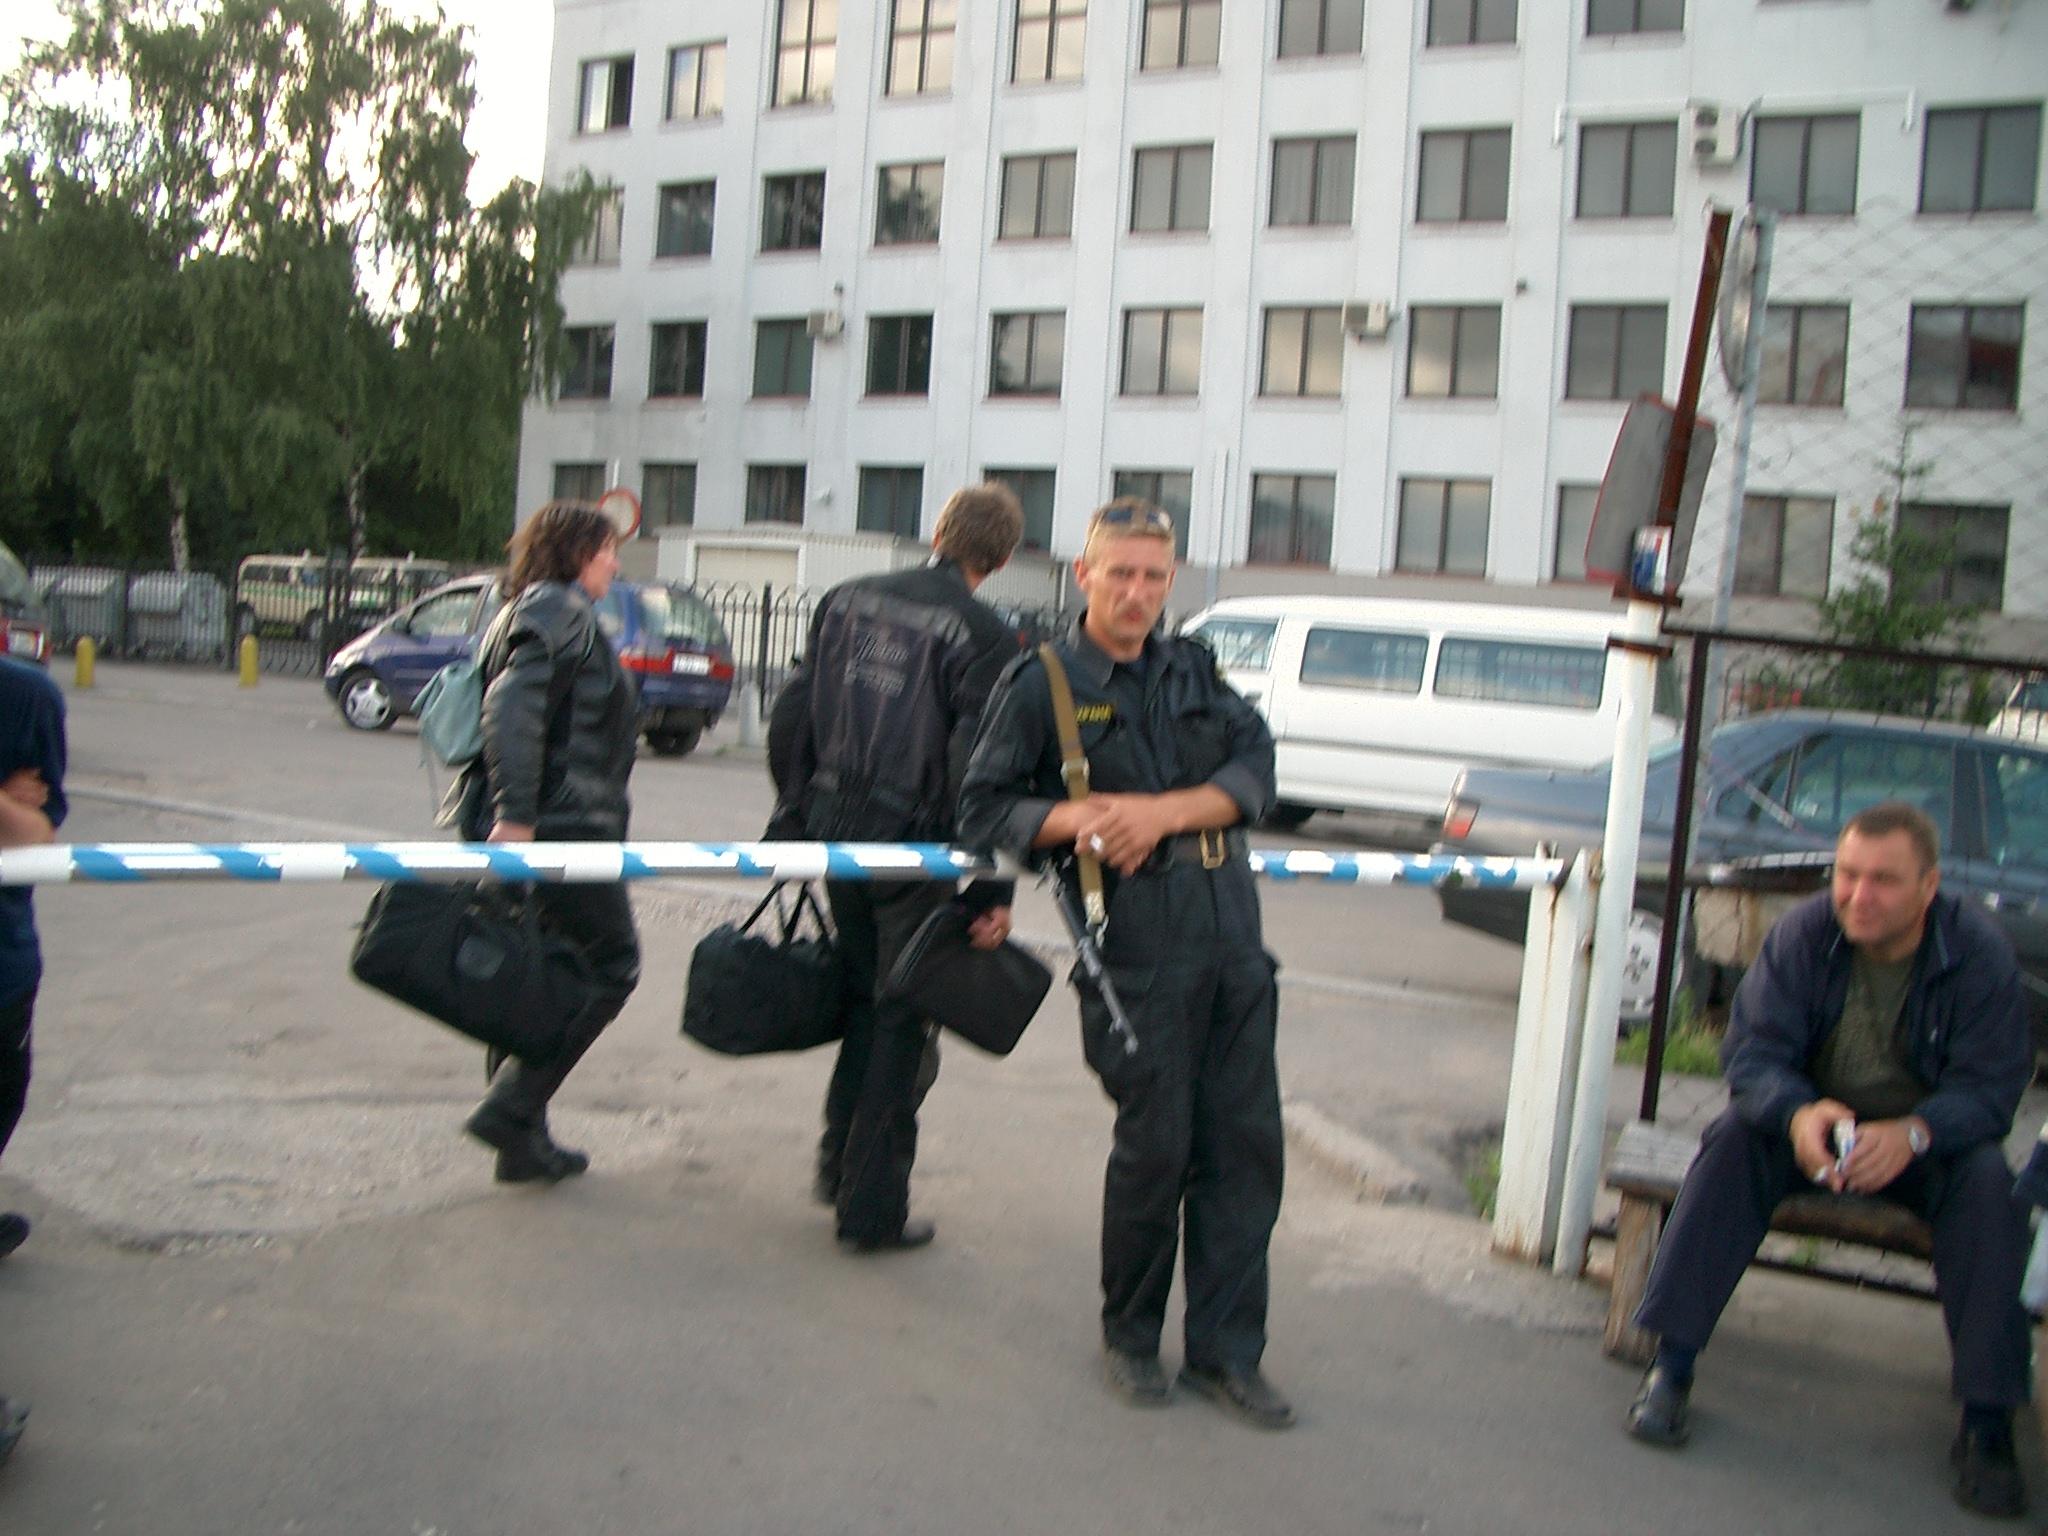 Parkplatzwärter mit Kalaschnikow